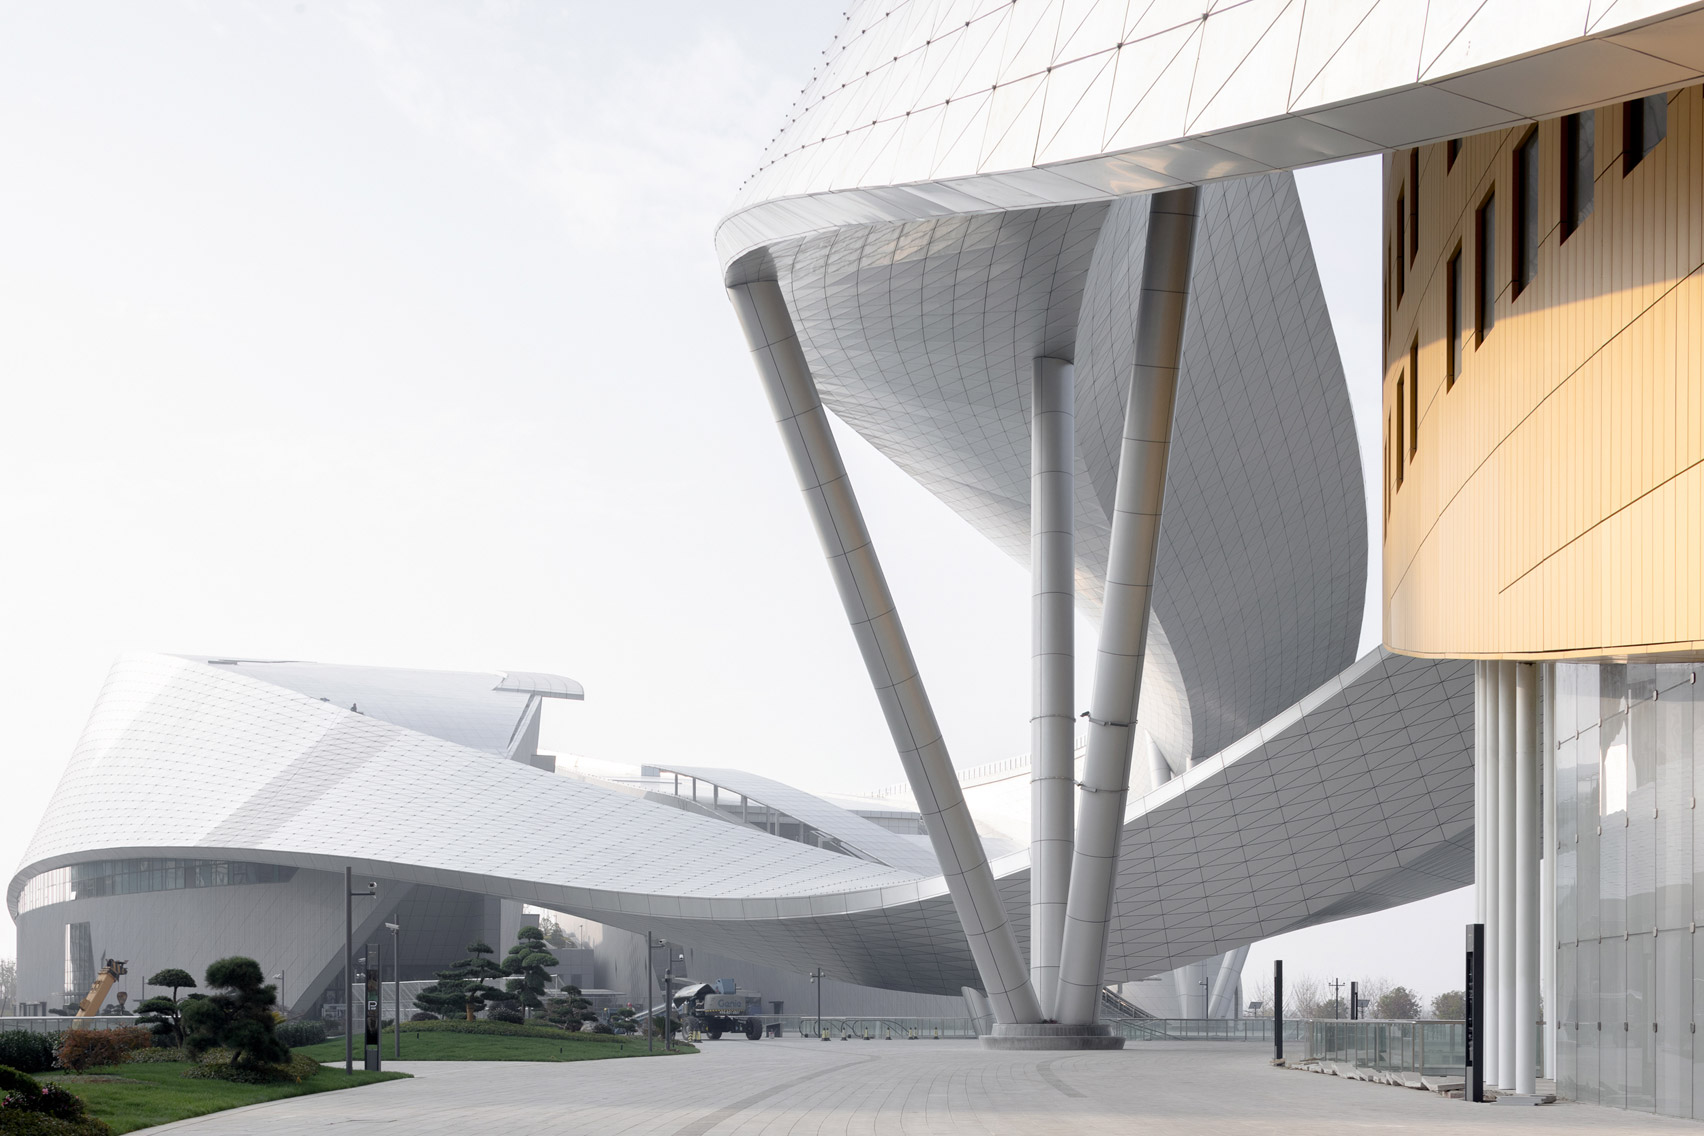 The ribbon that enfolds the Suzhou Bay Cultural Center by Christian de Portzamparc